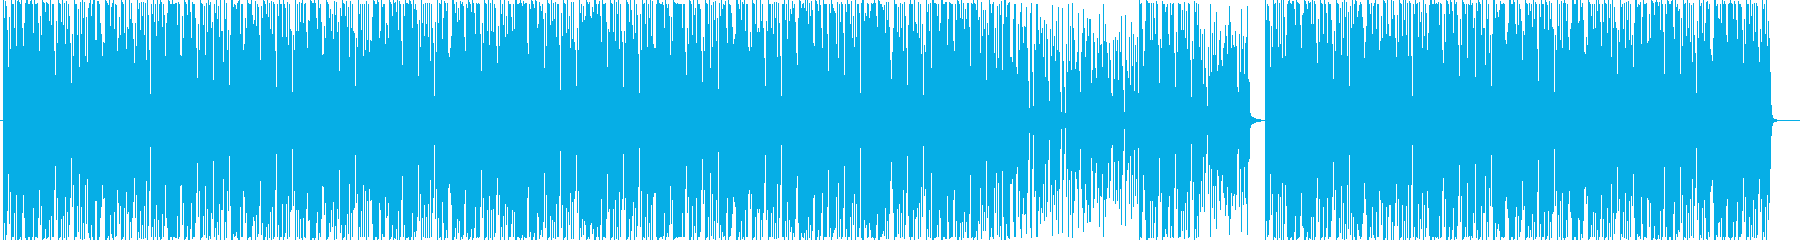 80's エレクトロサウンド の再生済みの波形